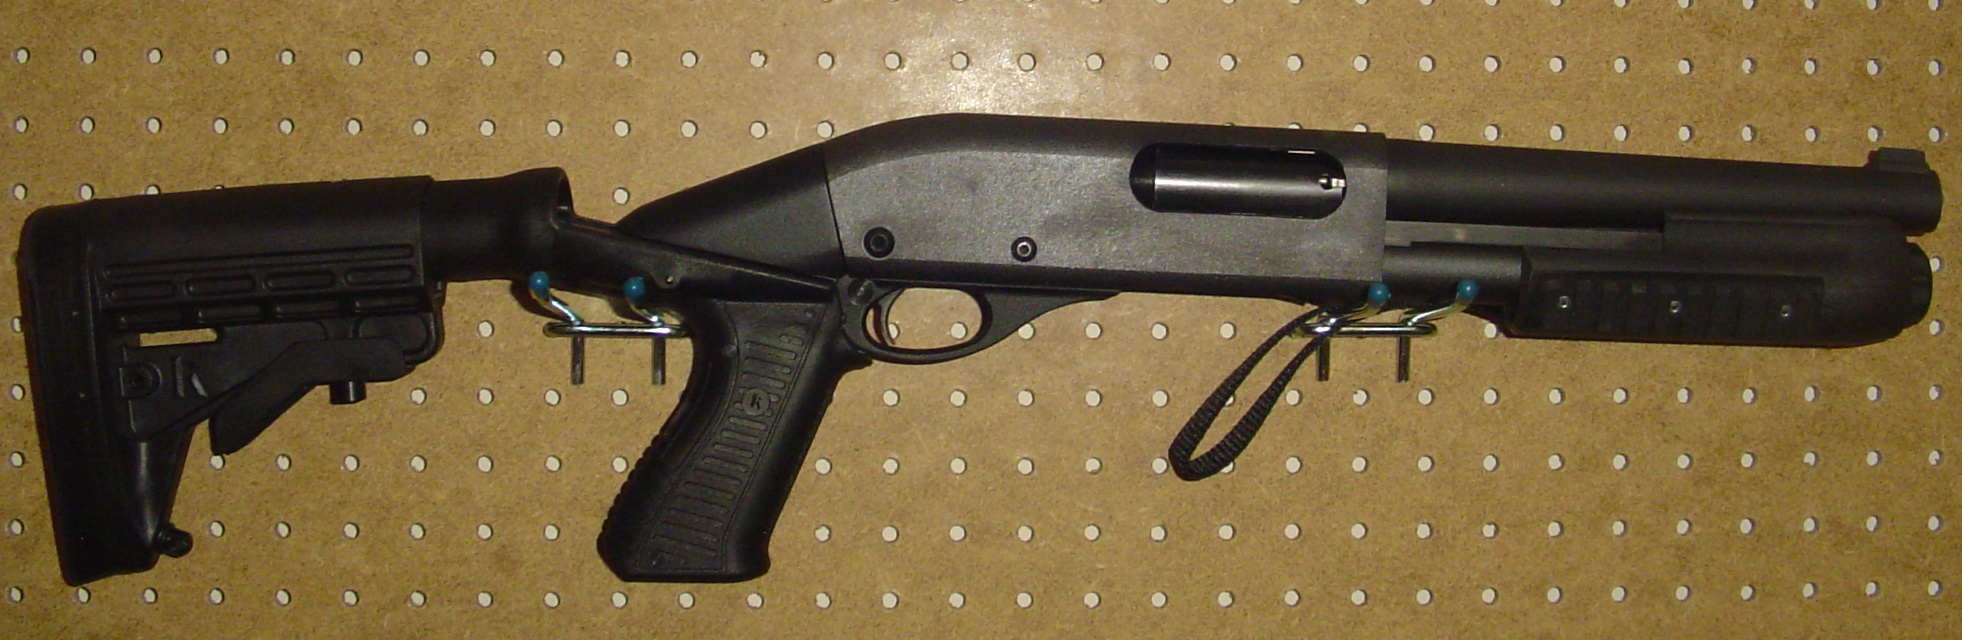 Sawed Off Shotgun Military Wiki Fandom Powered By Wikia